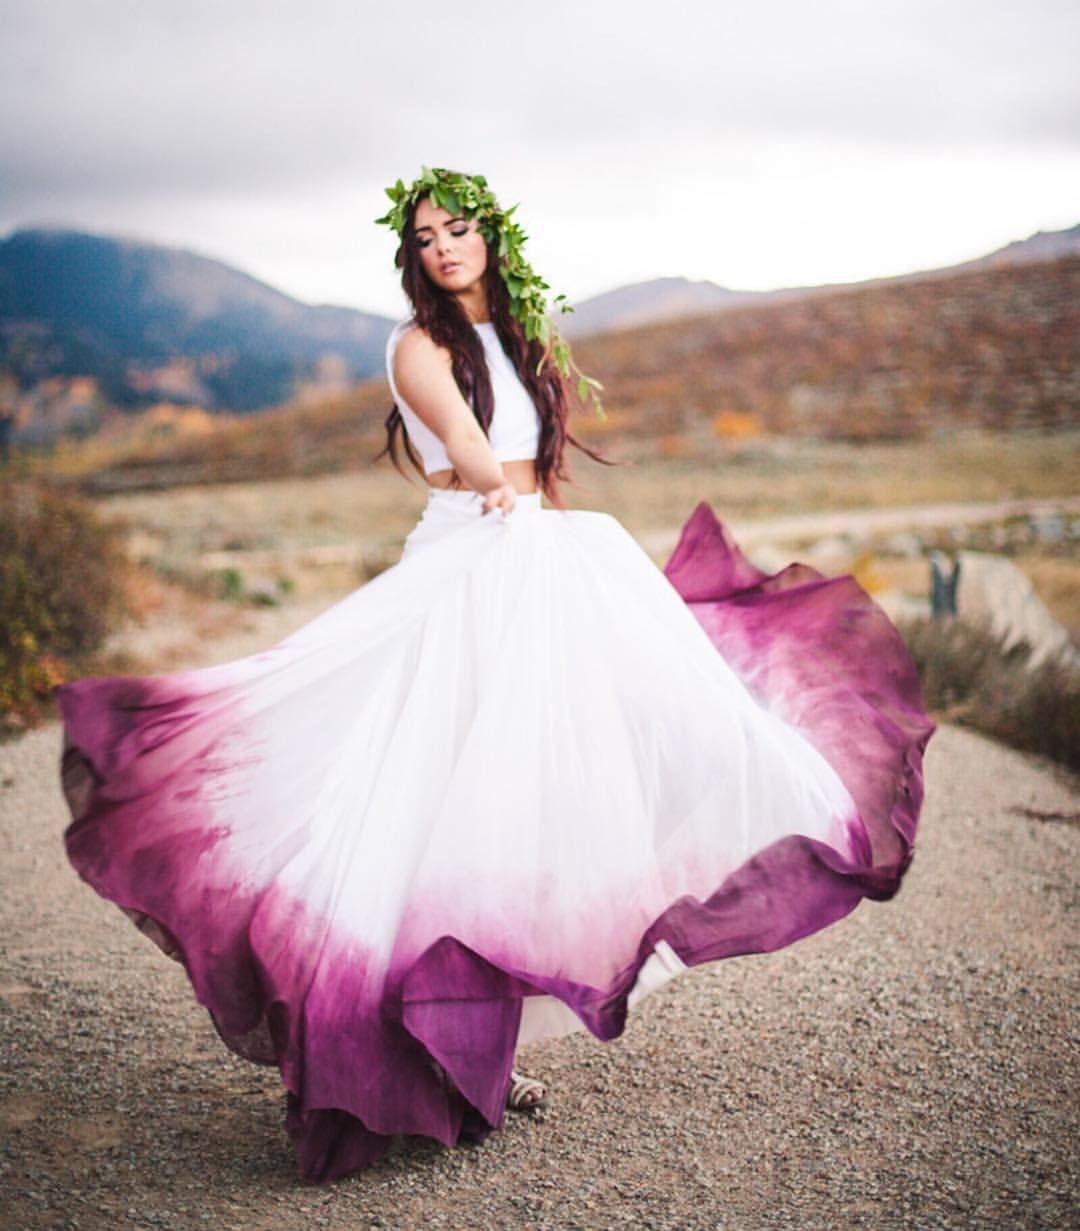 Dipped wedding dress  See this Instagram photo by alexalarsen u  likes  fashion